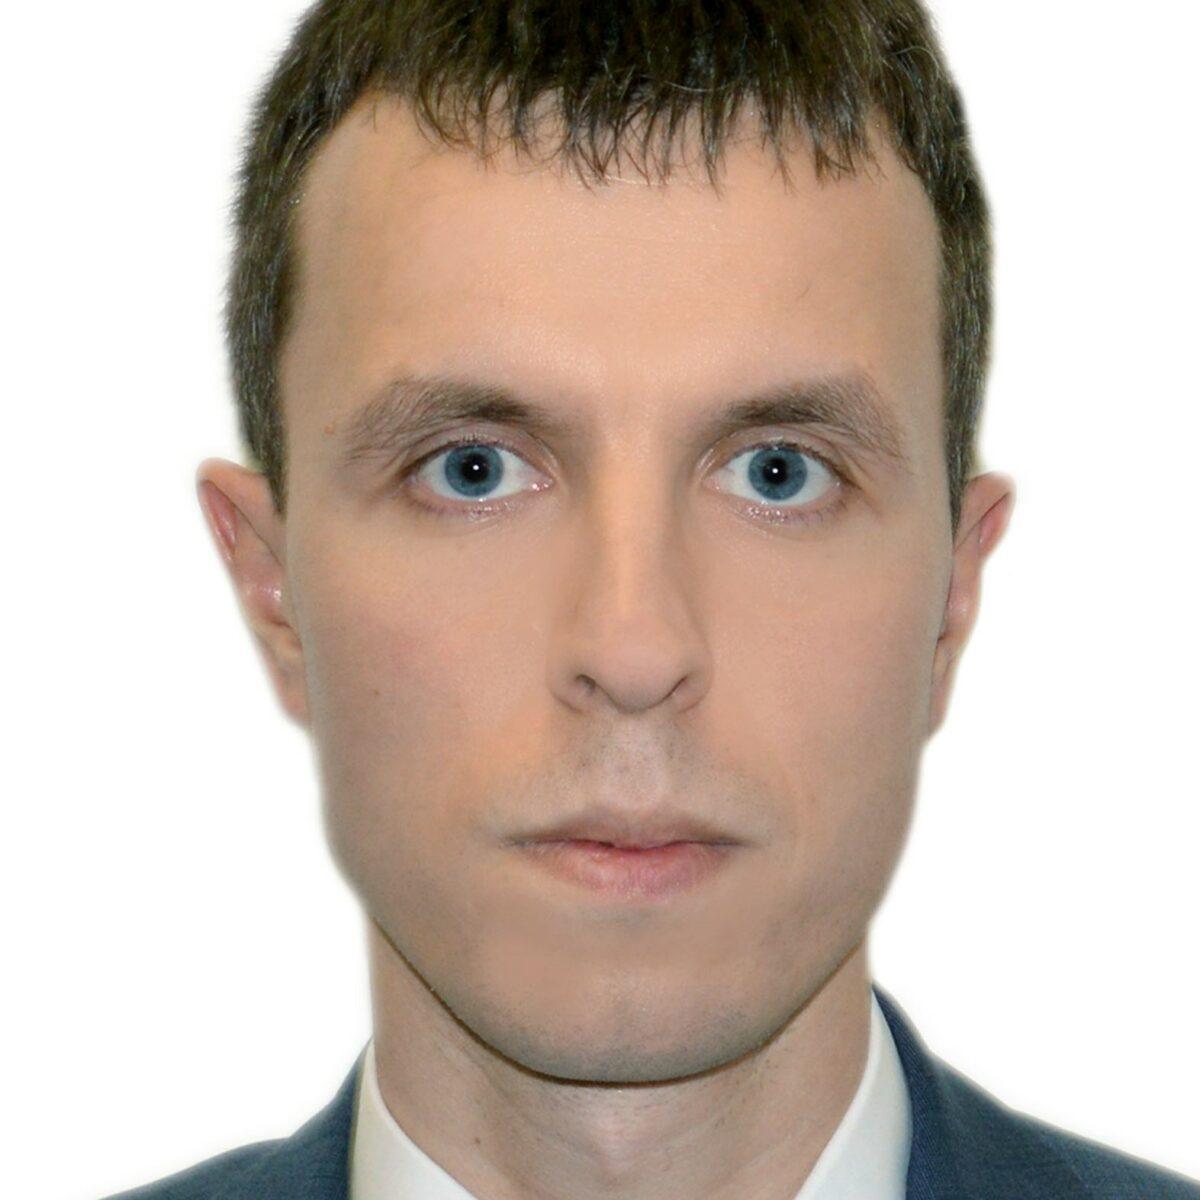 Житлухин Михаил Валентинович